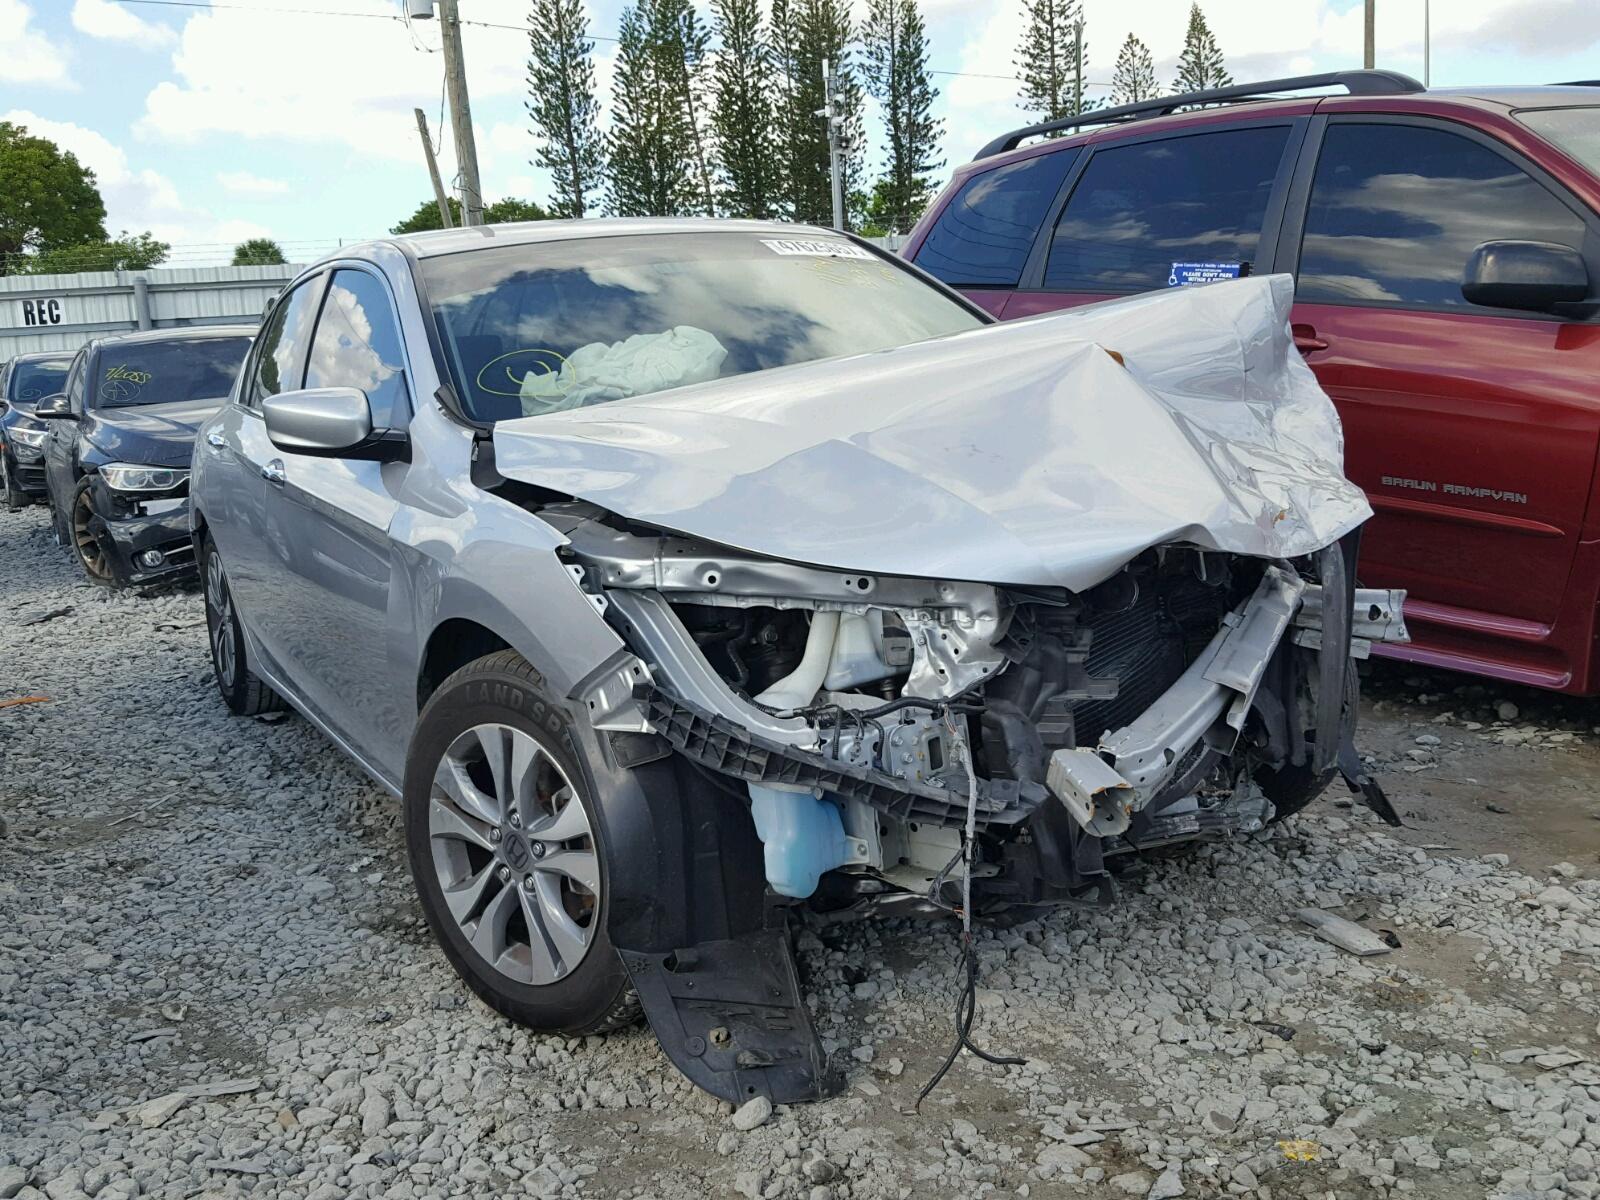 Jacksonville Auto Salvage >> Auto Auction Ended on VIN: JH2KF0106HK202287 1987 HONDA CH150 in OK - TULSA